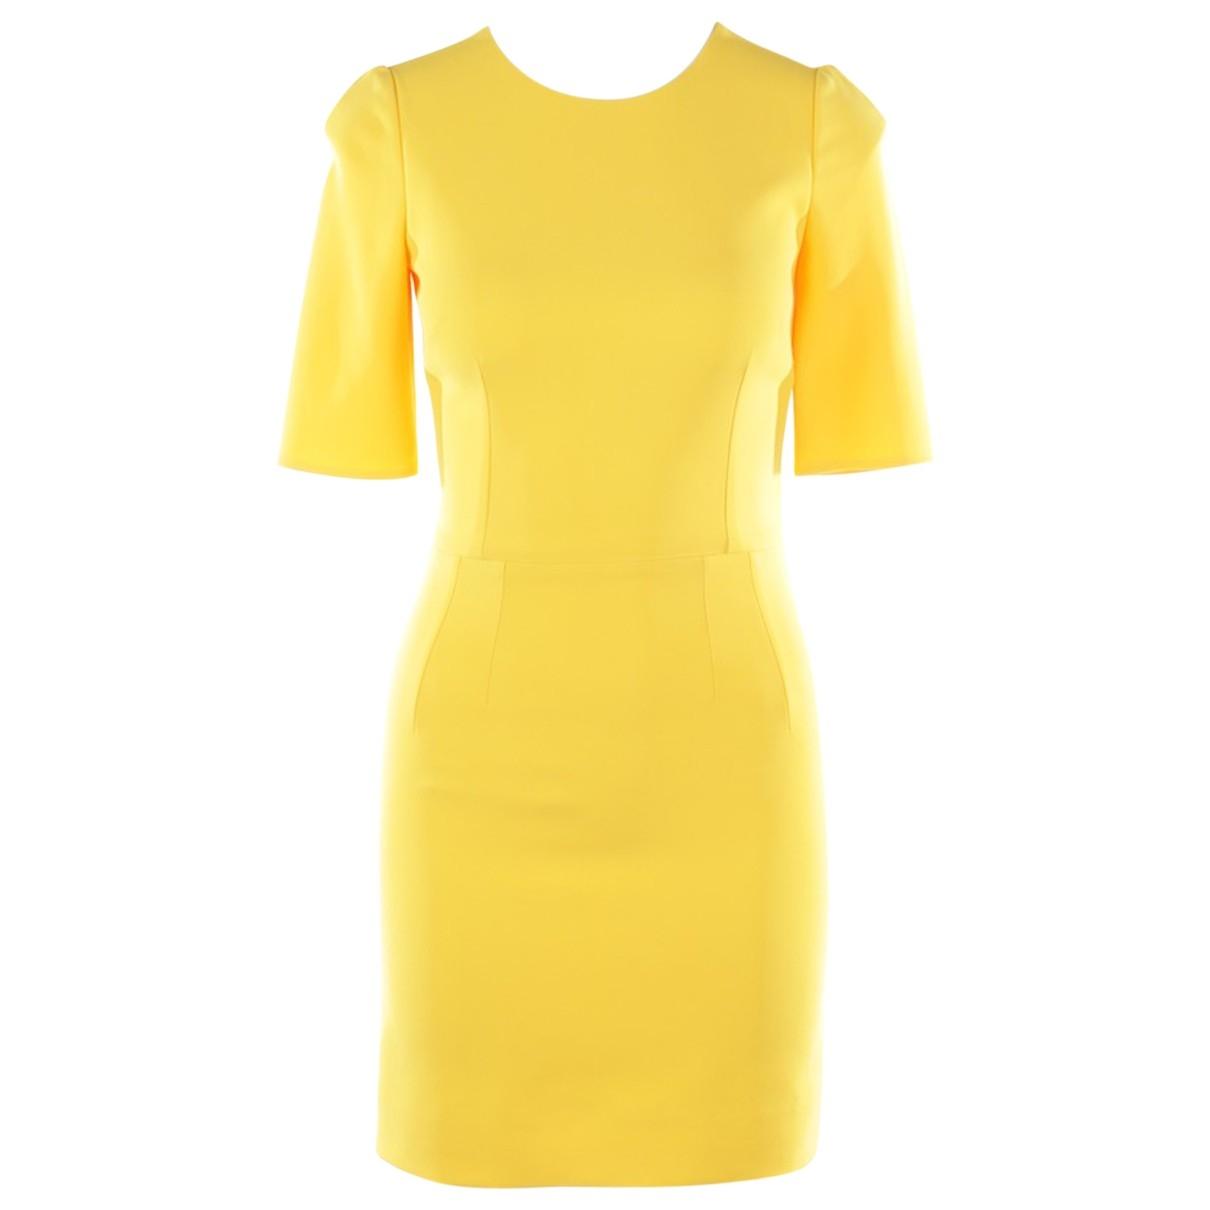 Dolce & Gabbana \N Kleid in  Gelb Viskose